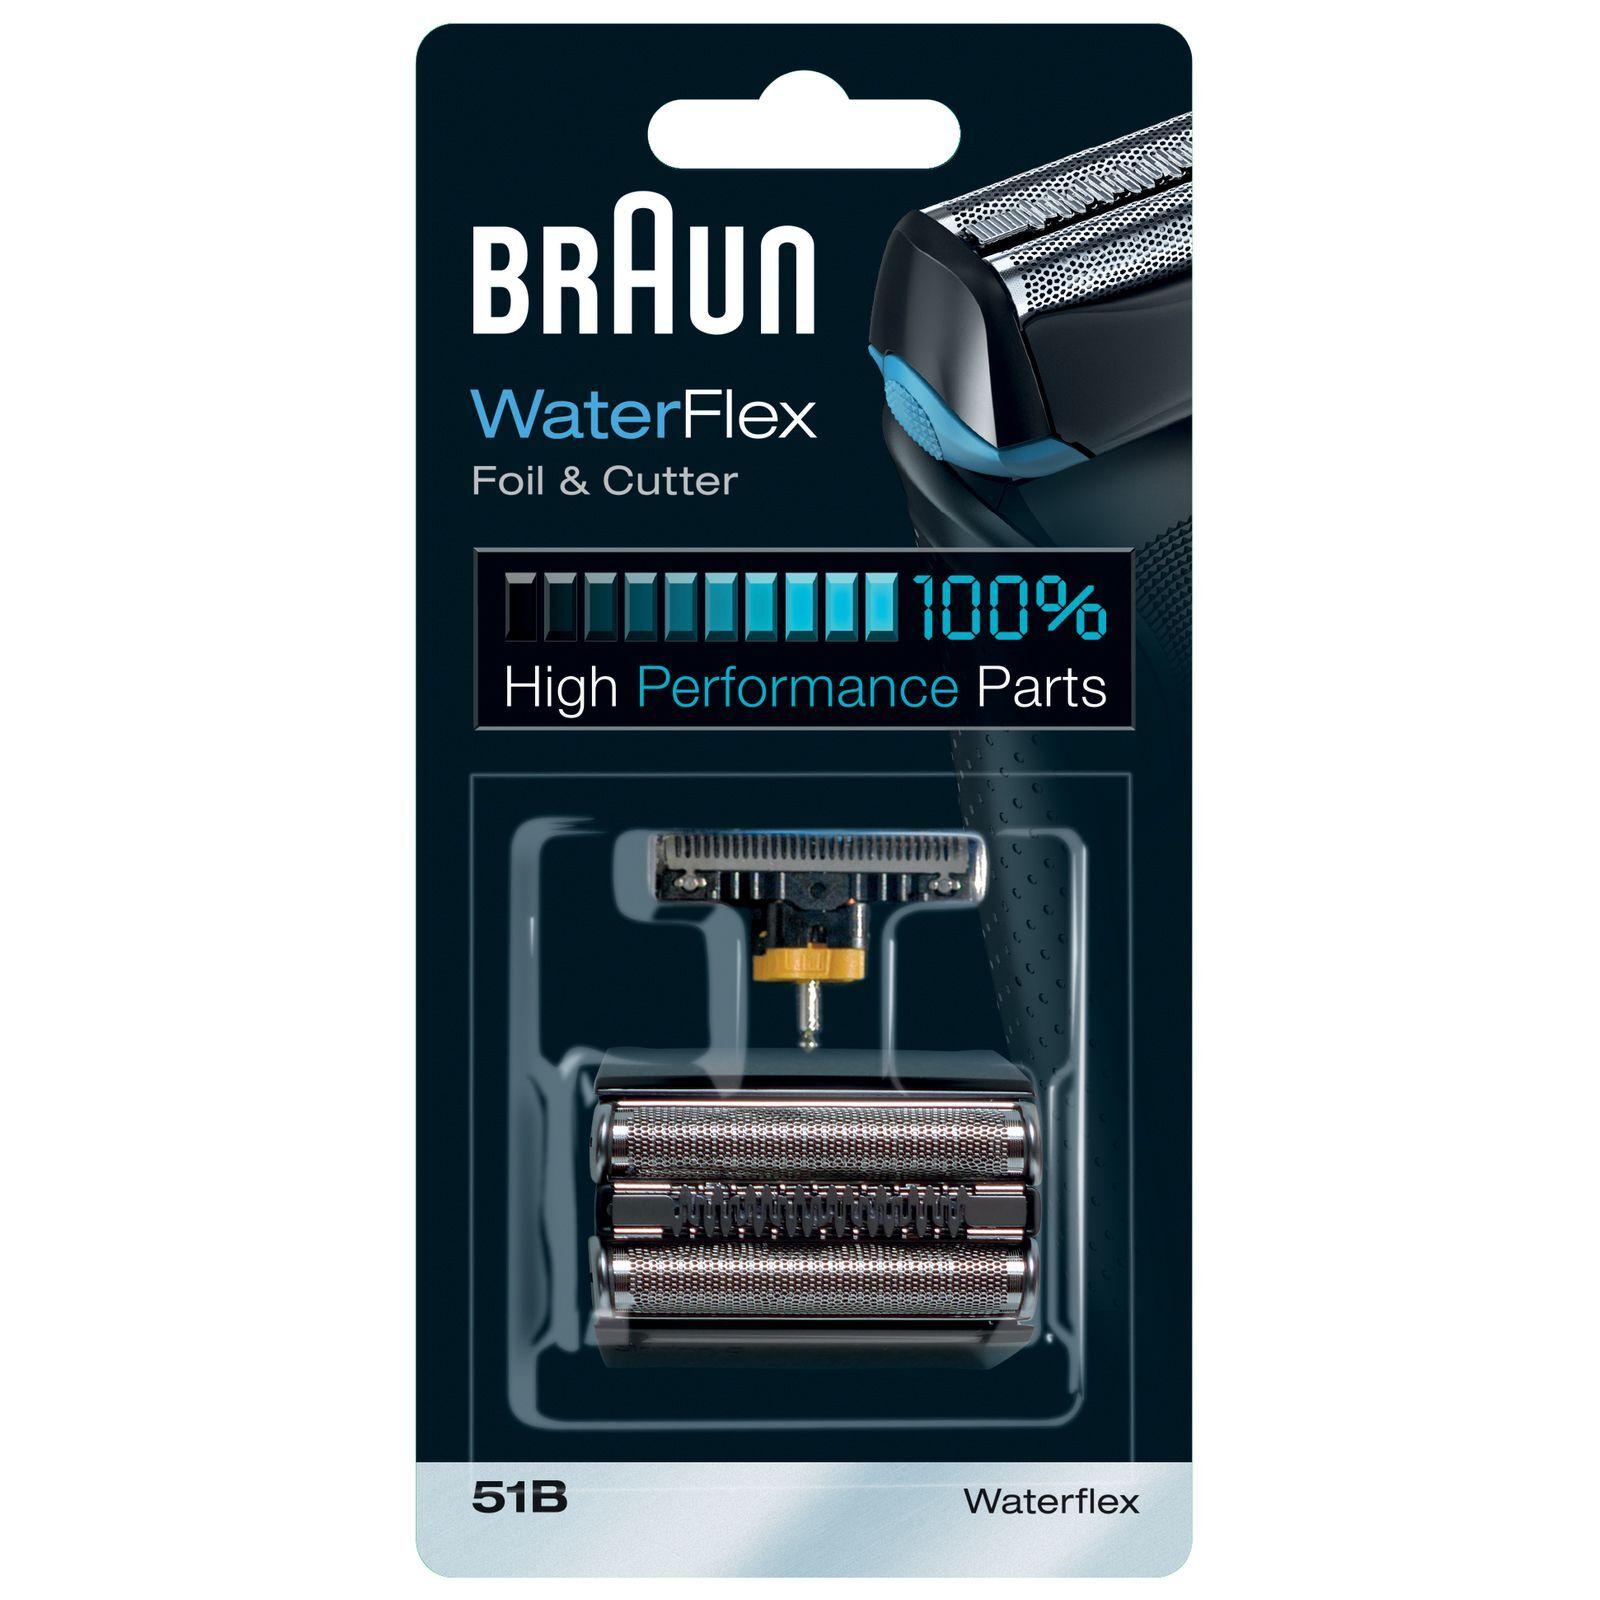 Braun - Replacement Heads WaterFlex Foil and Cutter 51B for Men